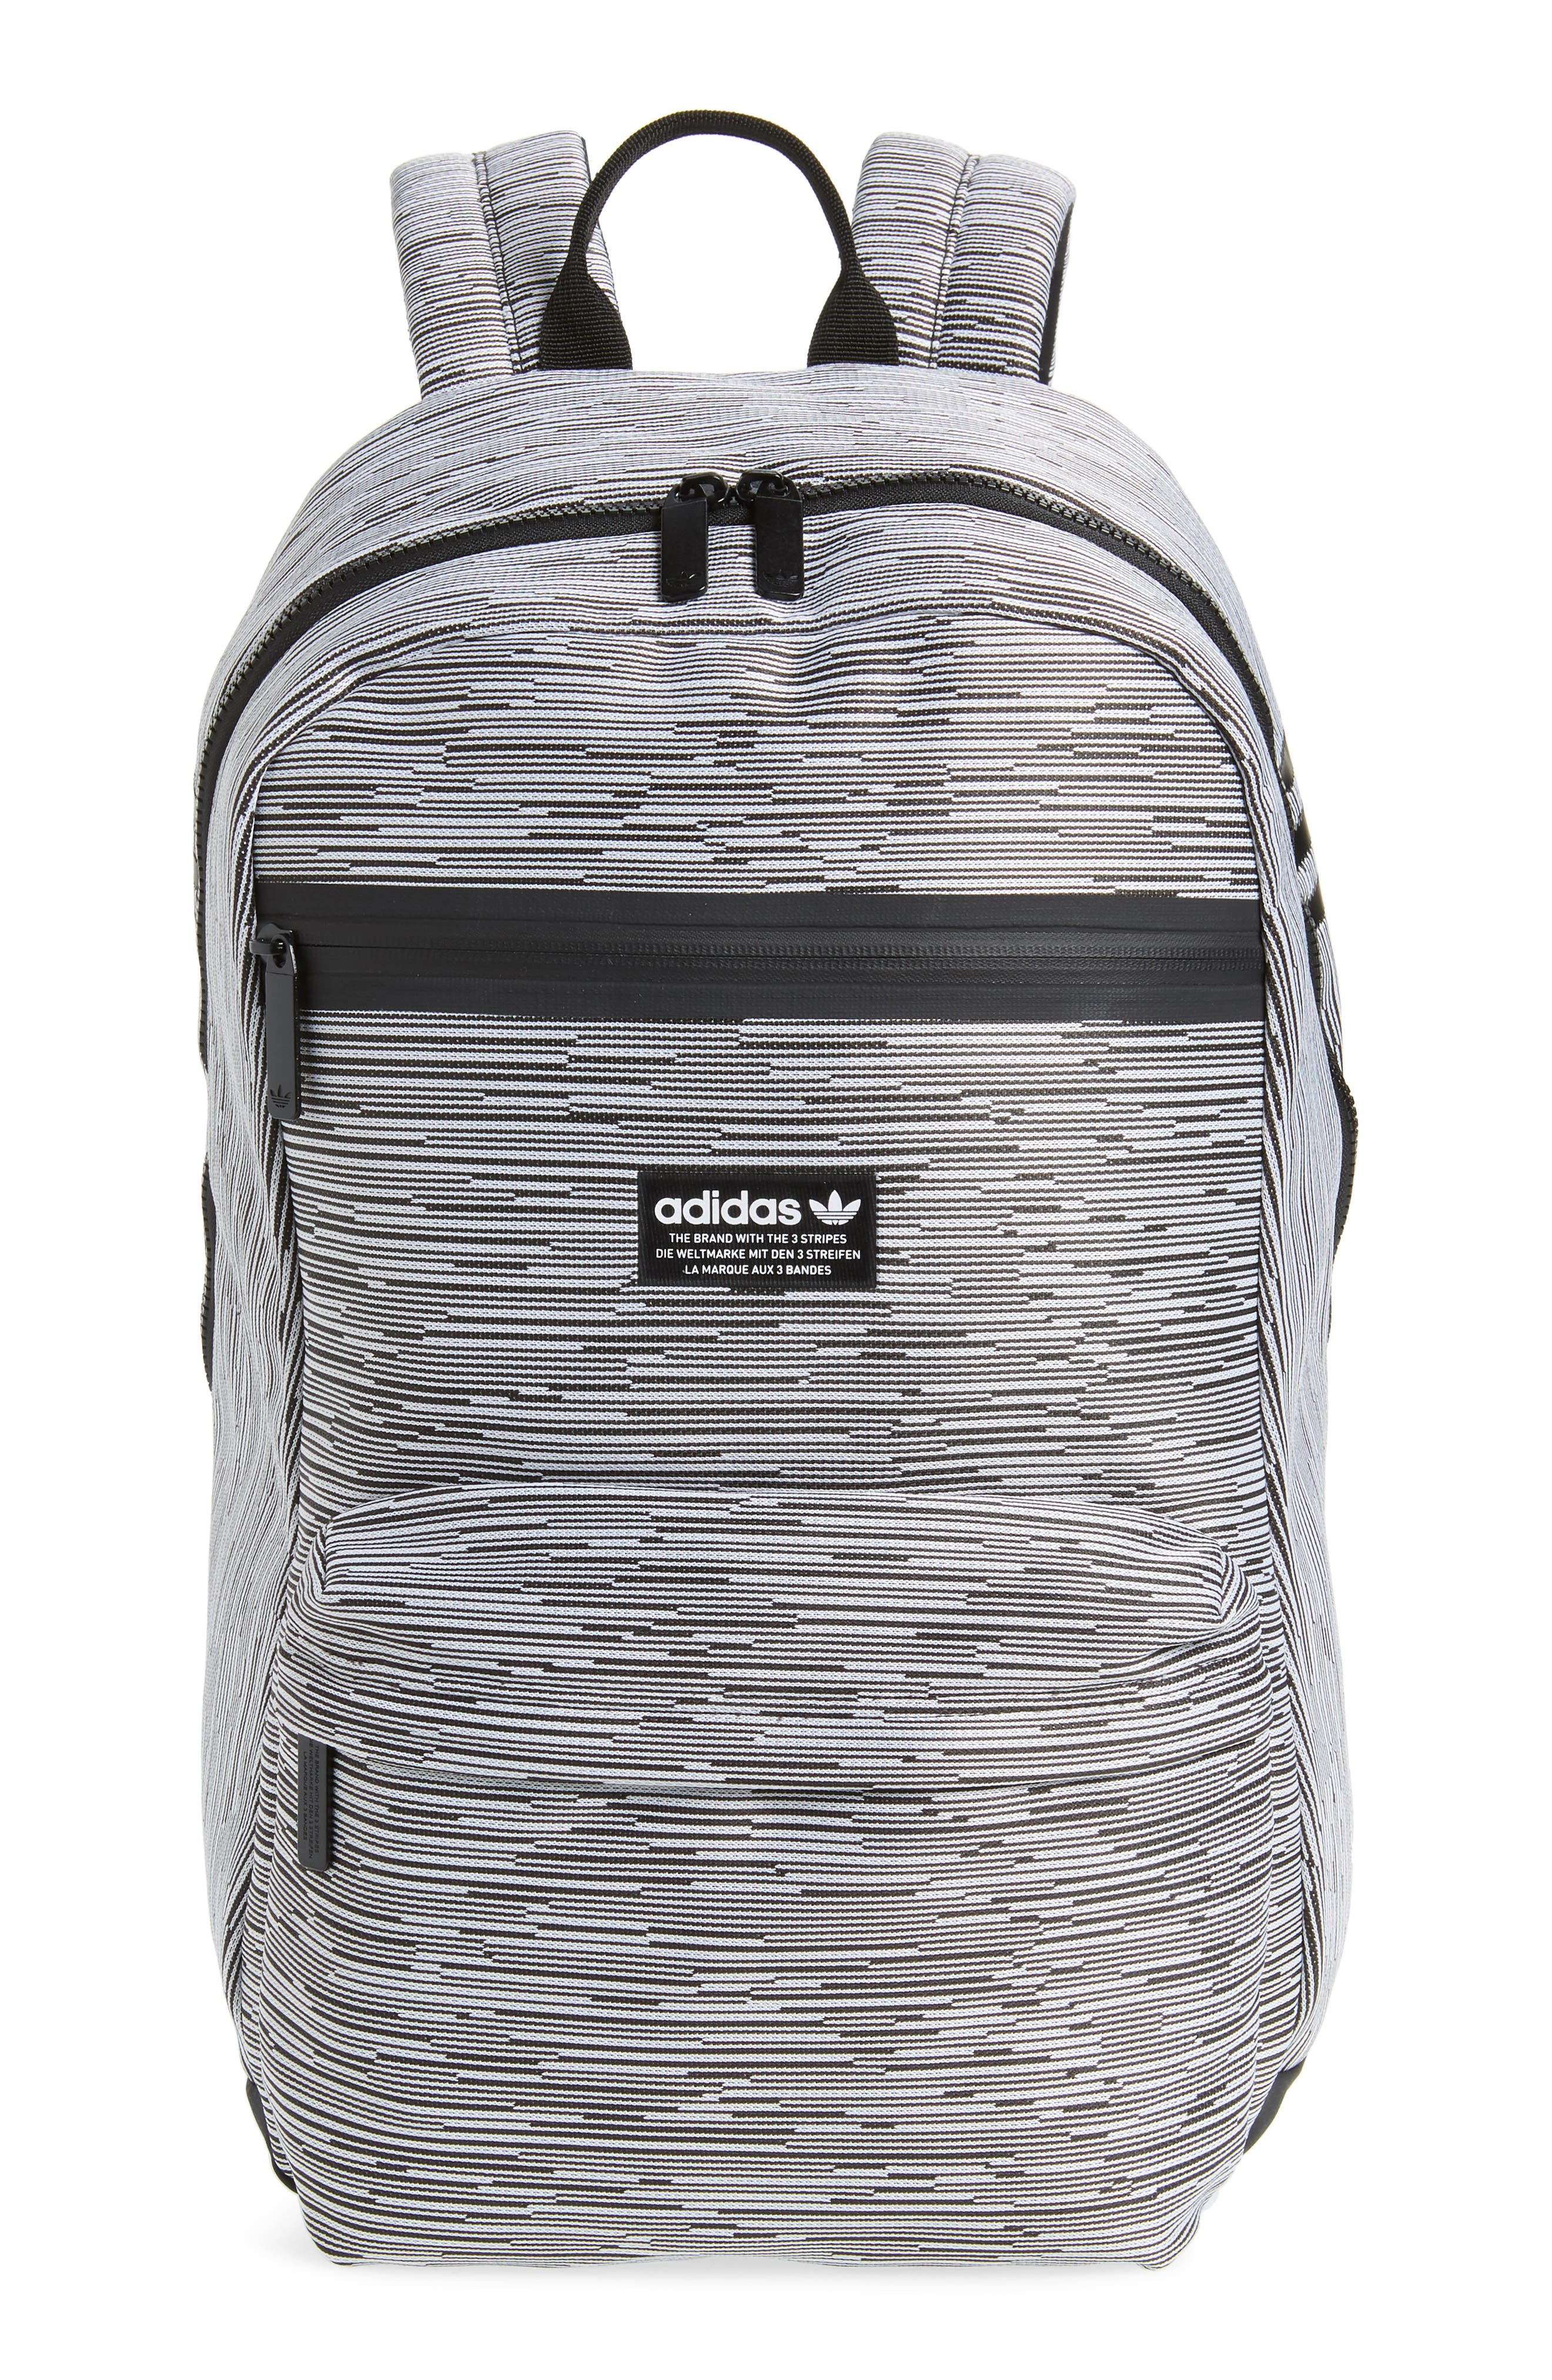 Adidas Originals National Primeknit Backpack - Grey